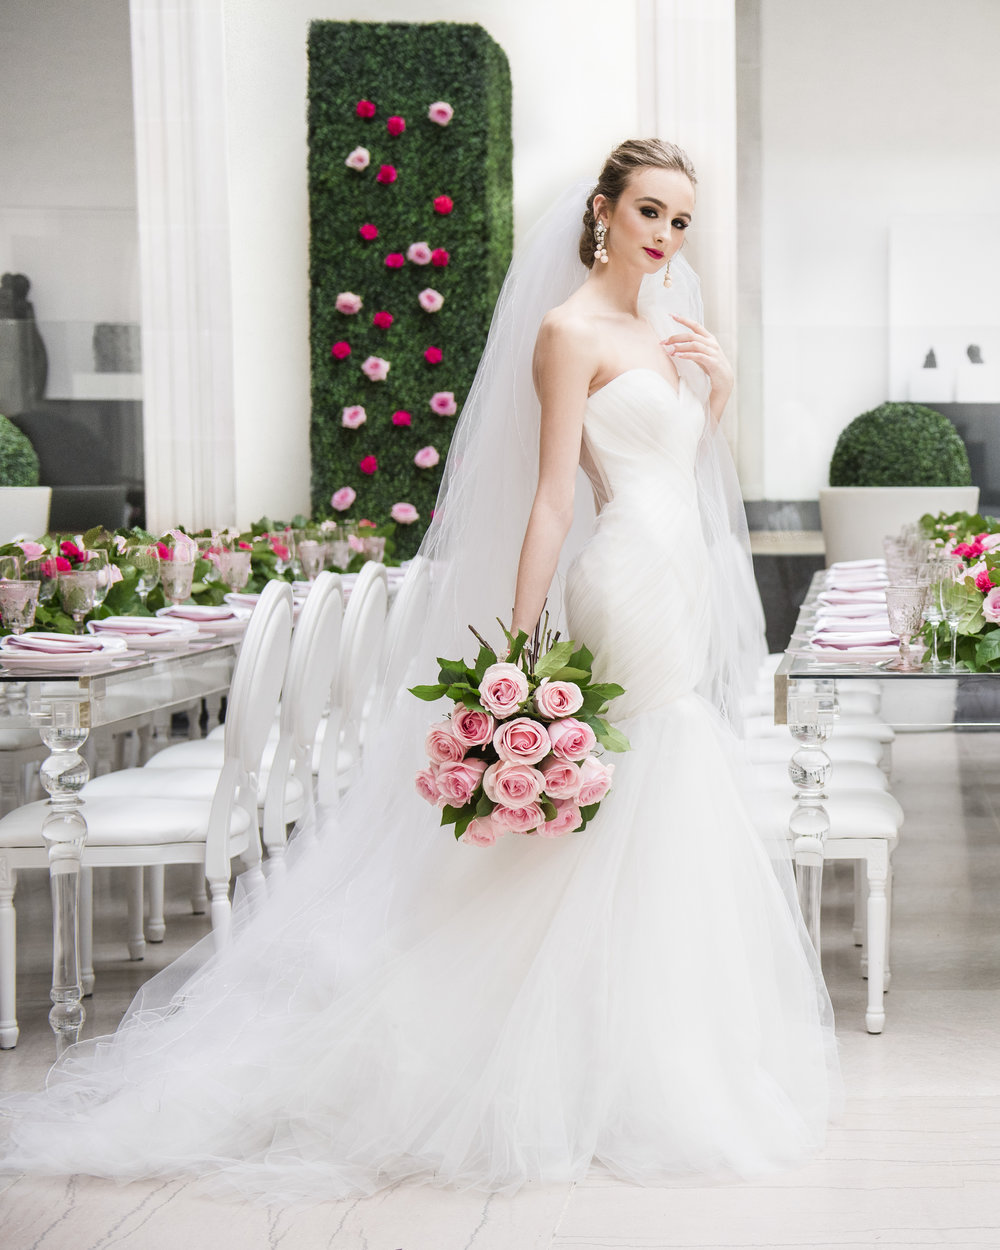 Bride in garden reception - Dior Darling (Wedluxe)